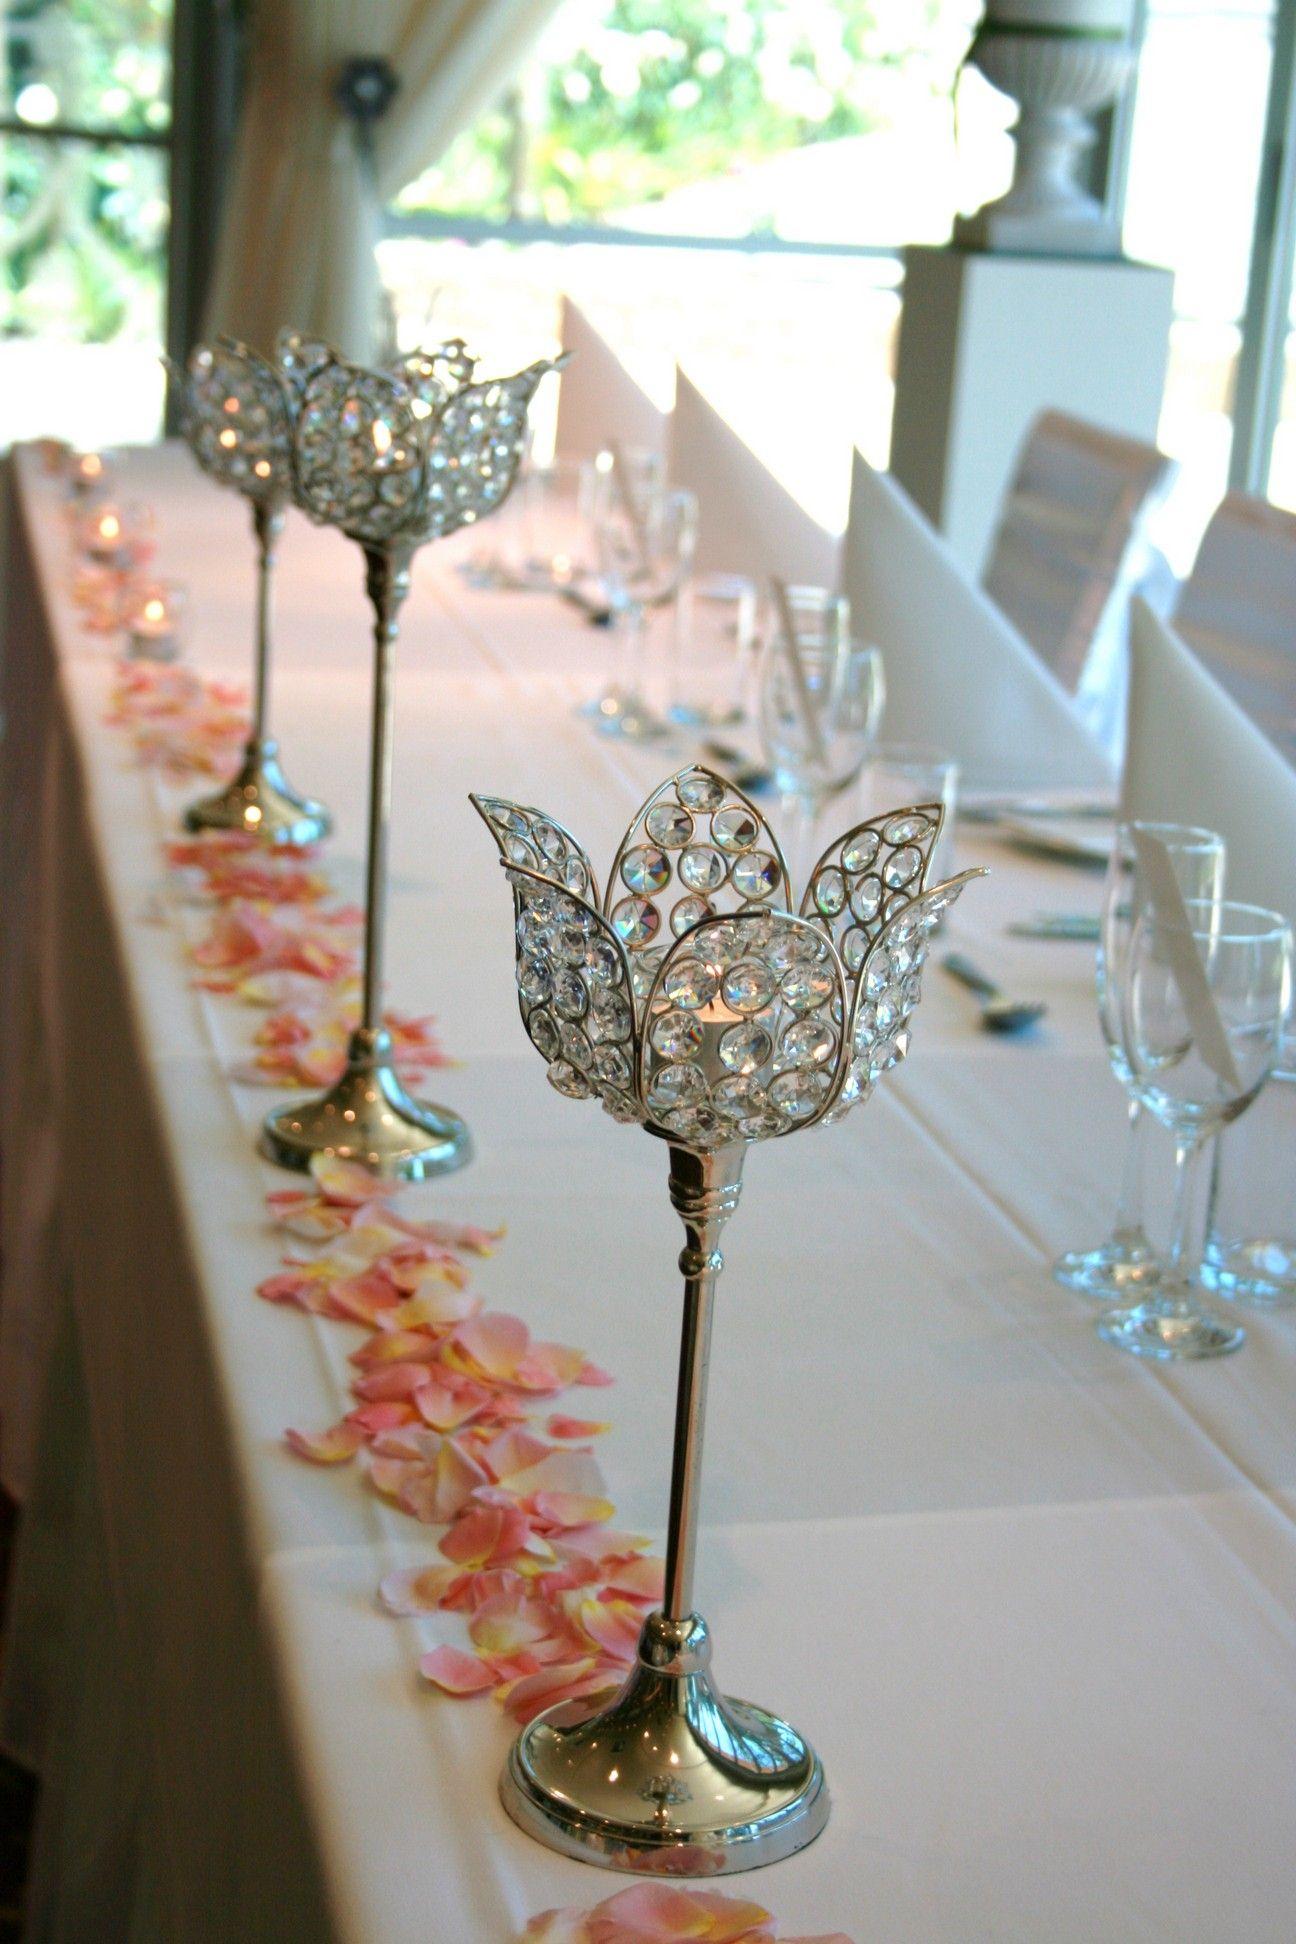 Diy wedding table decorations ideas  DIY elegant table decorations  decor  Pinterest  Elegant table